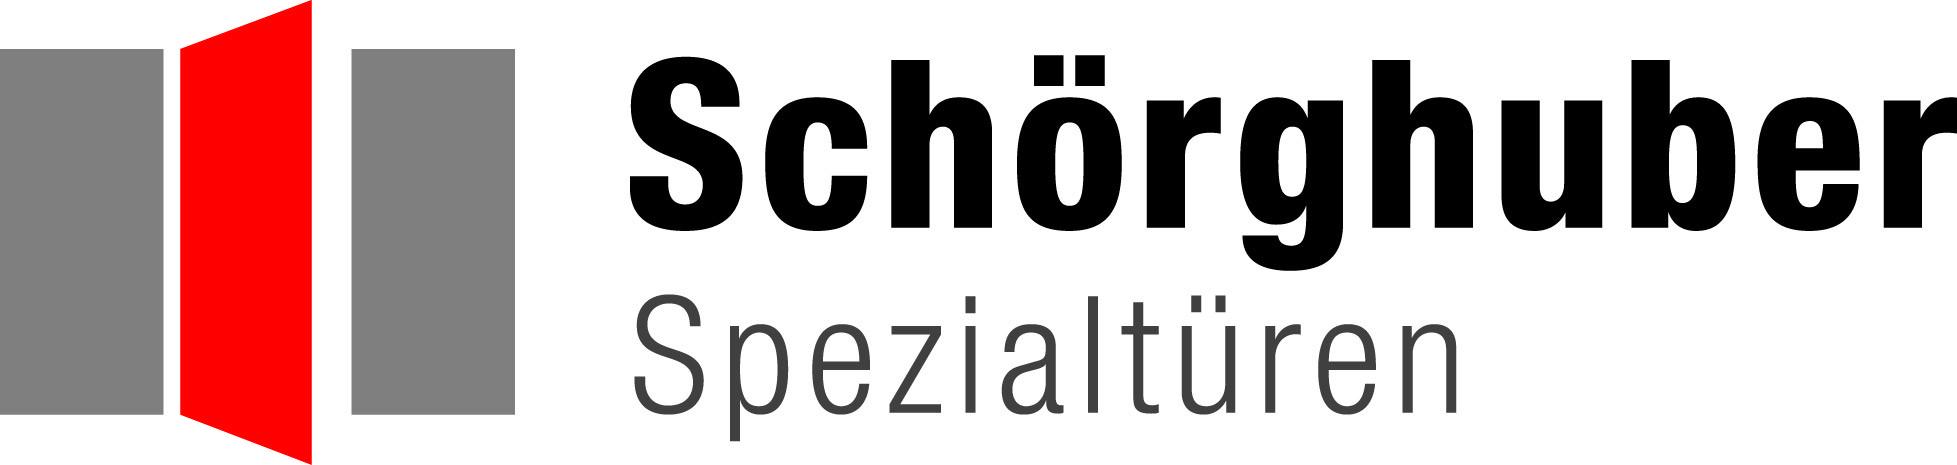 Schörghuber Logo